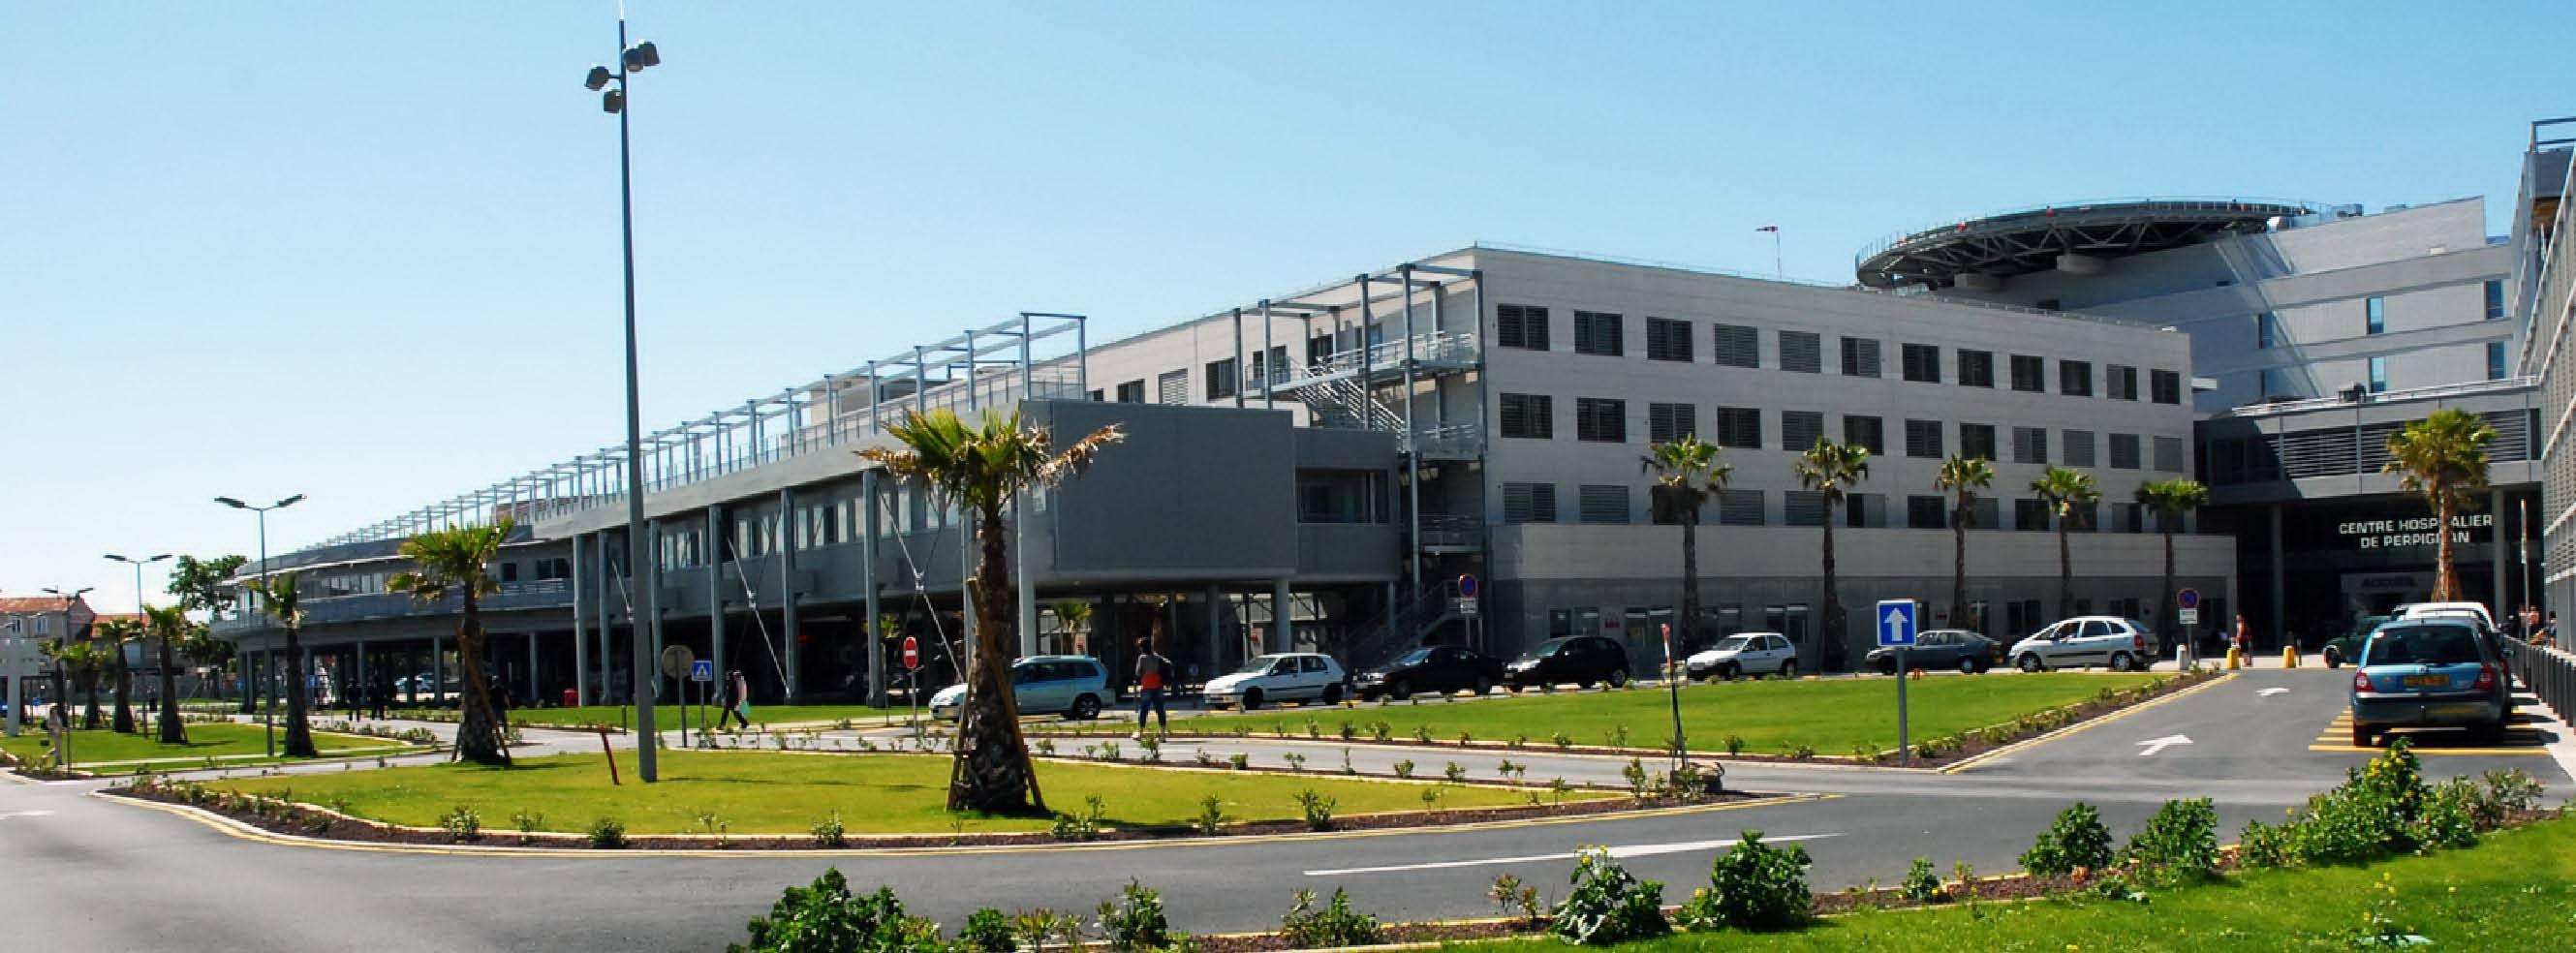 Photo de Centre Hospitalier de perpignan